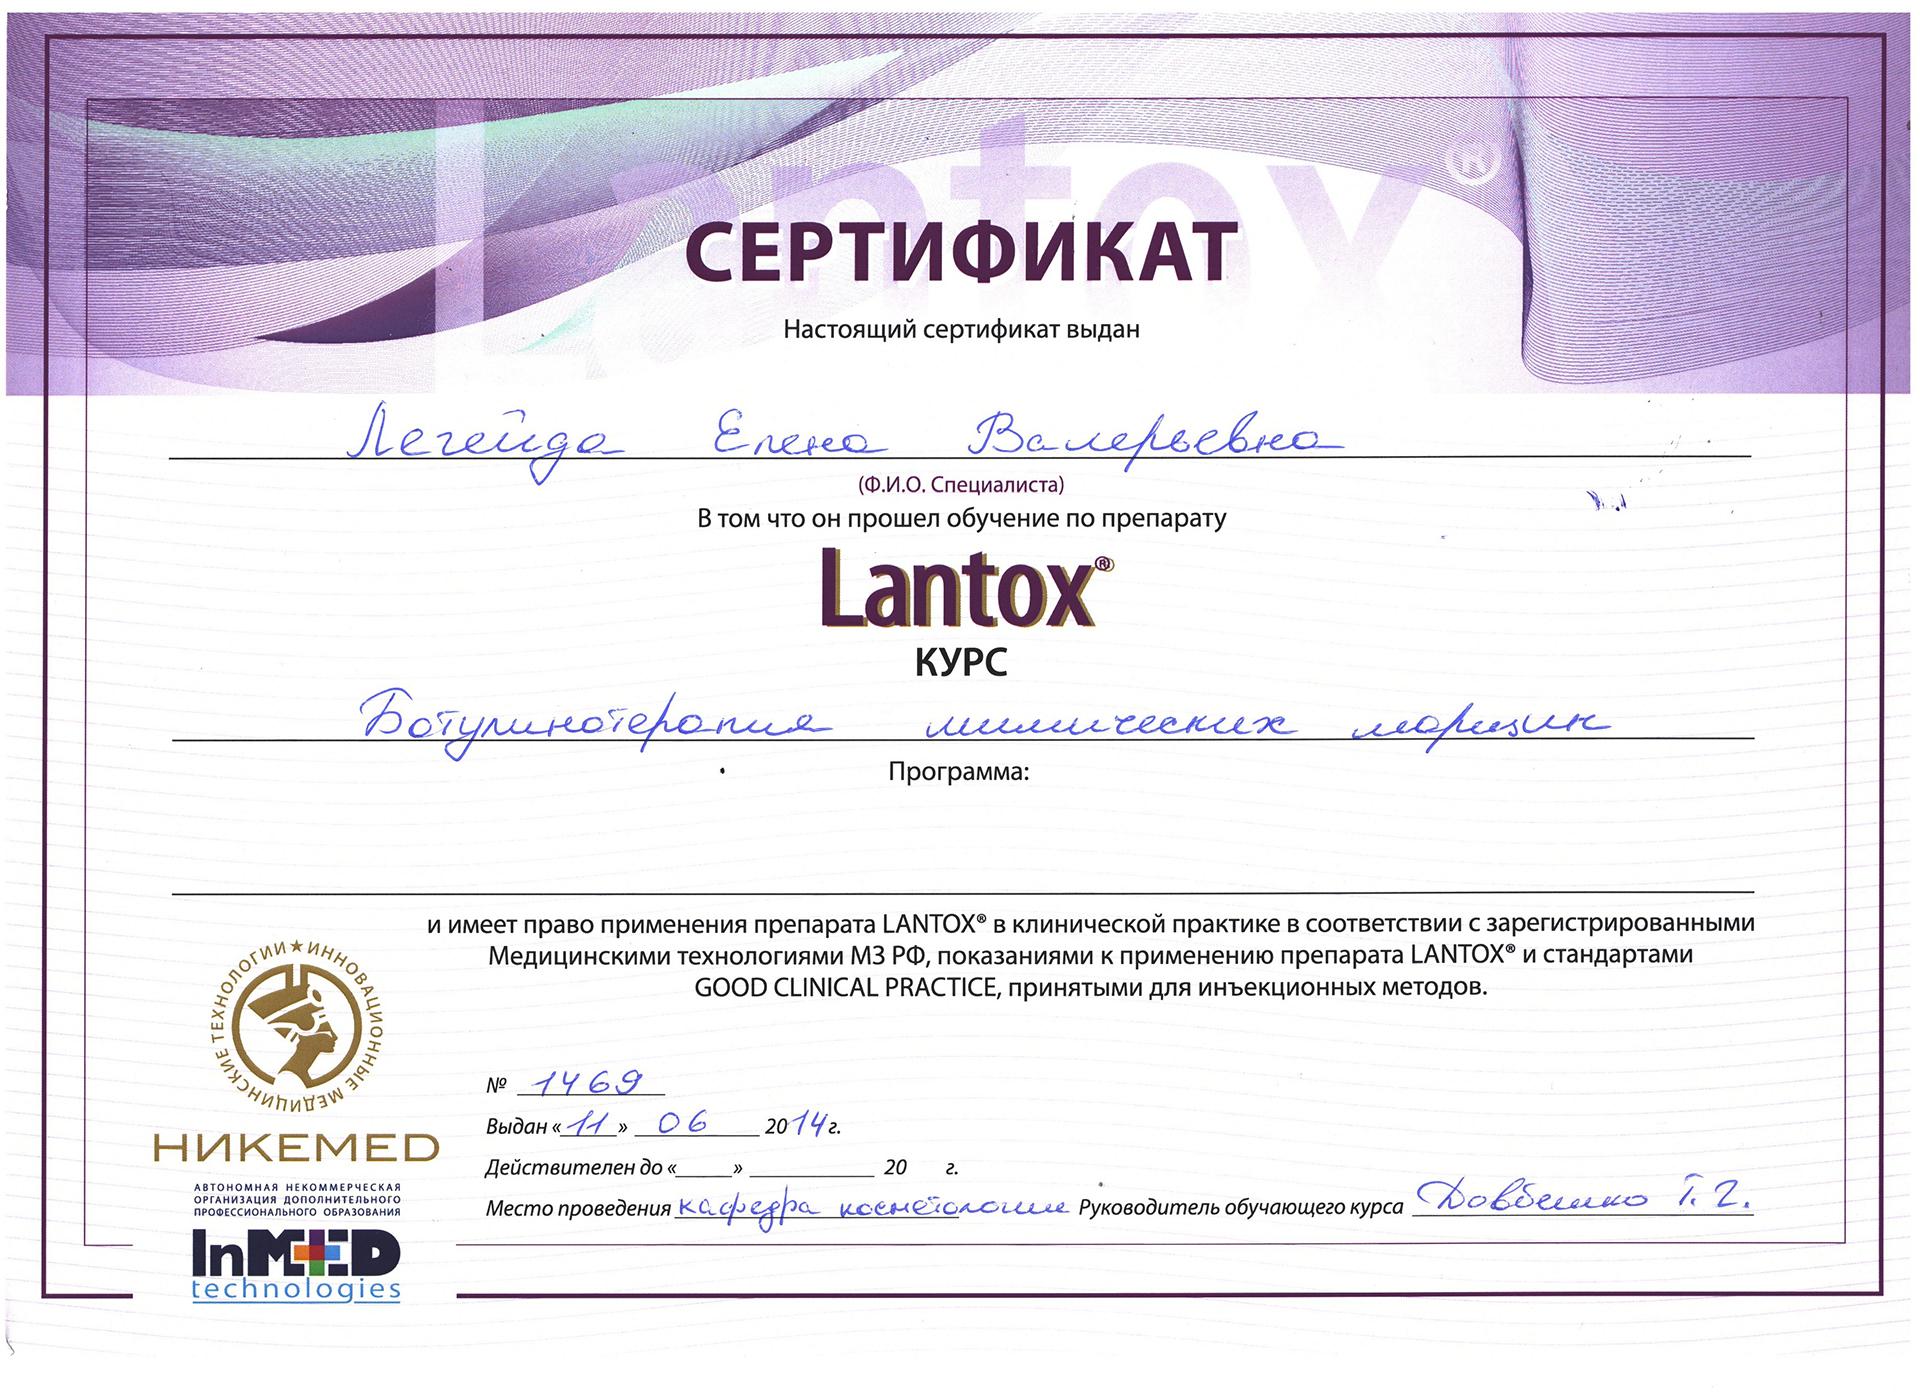 Сертификат — Обучение по препарату Lantox. Легейда Елена Валерьевна